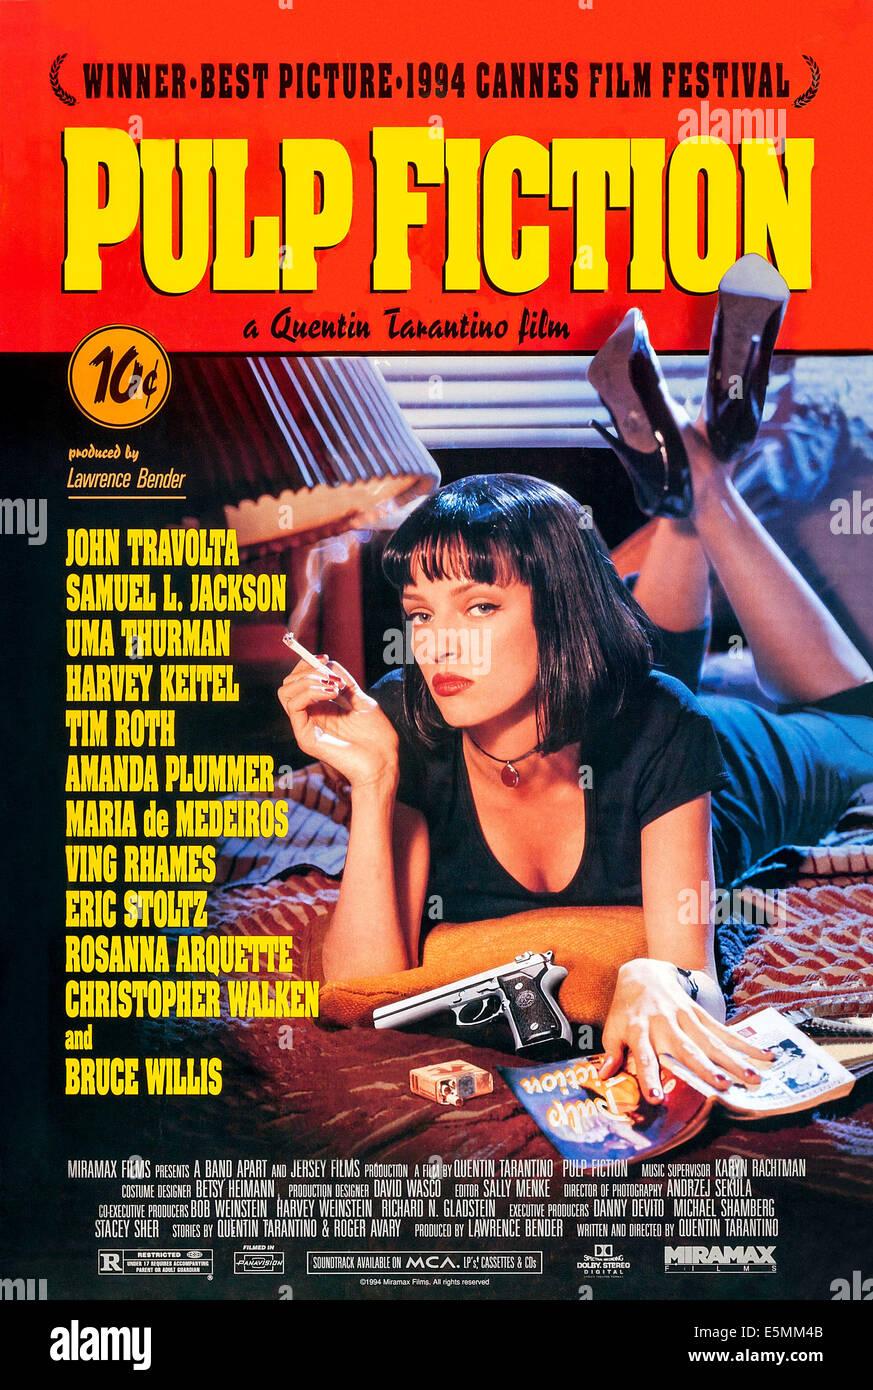 PULP FICTION US Poster Art Uma Thurman 1994 CMiramax Courtesy Everett Collection